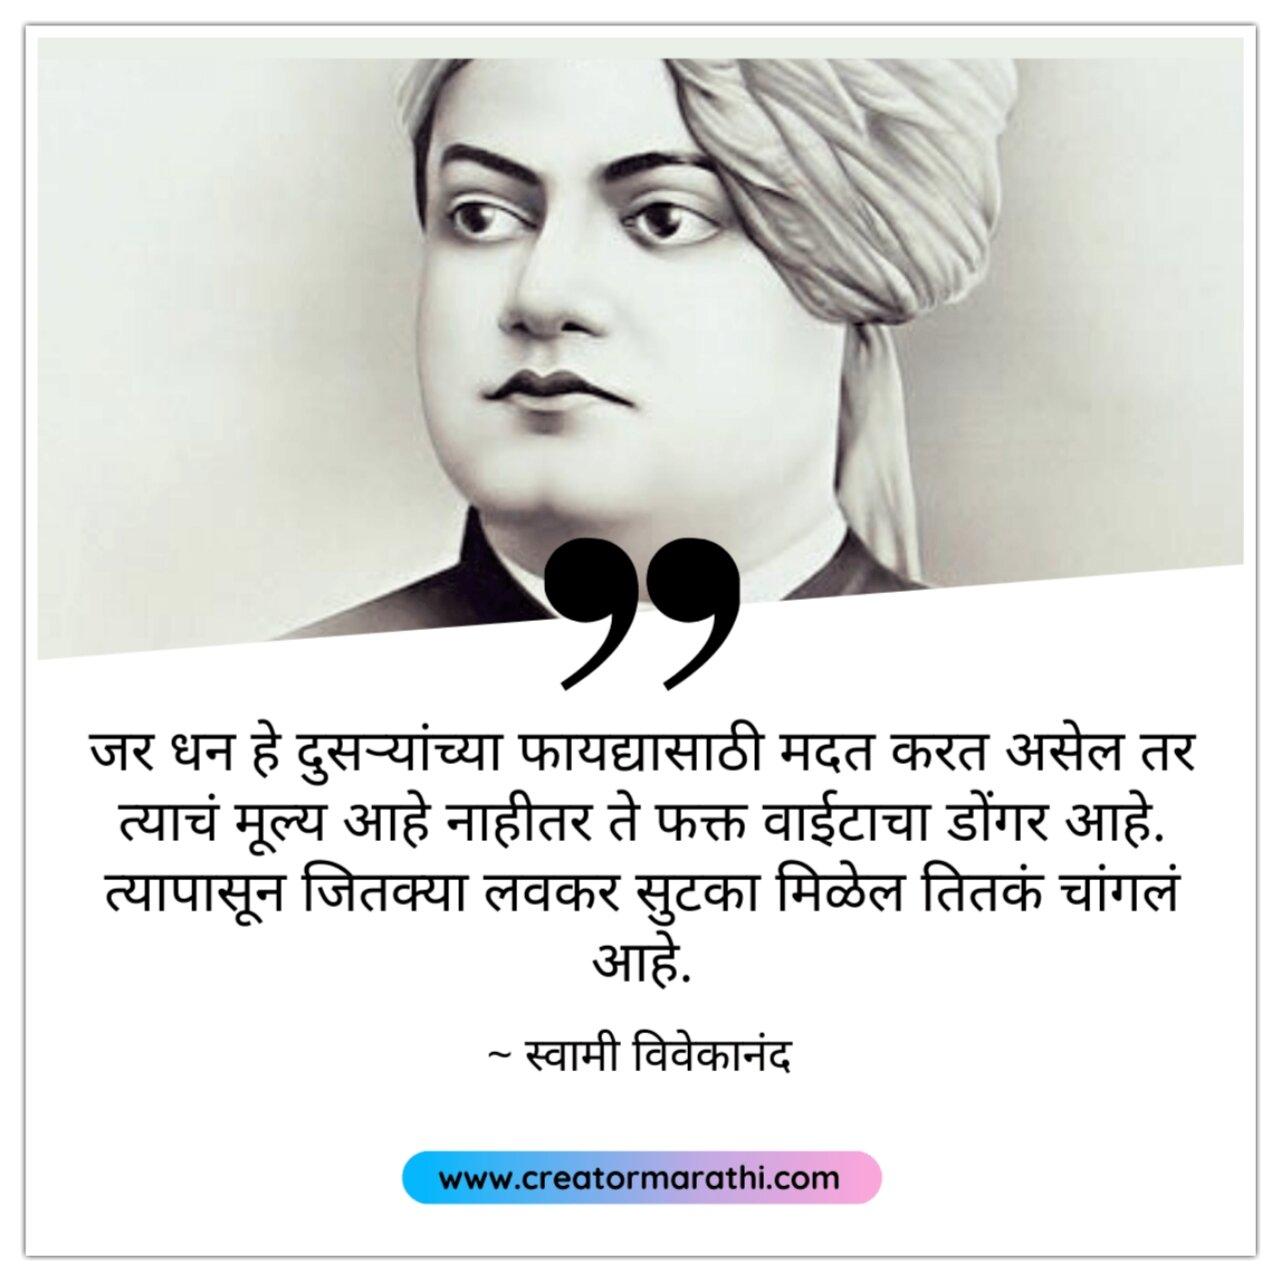 Swami Vivekananda motivational quotes In Marathi